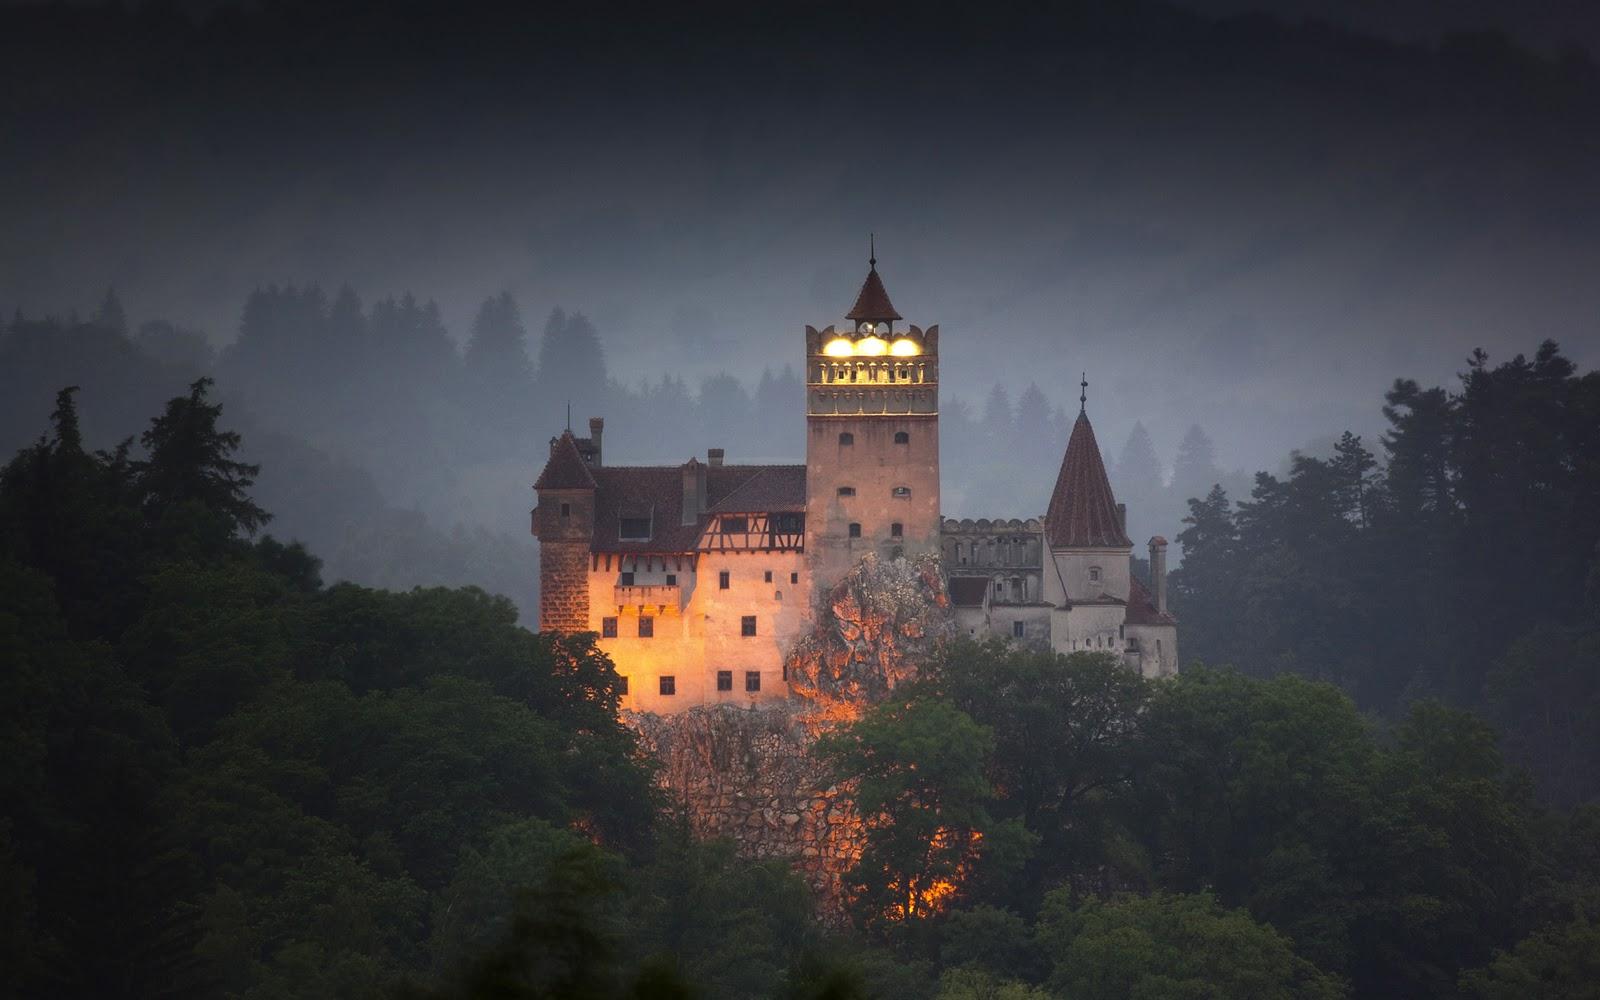 Bran Castle.http://thewondrous.com/wp-content/uploads/2014/09/The-Eerie-Bran-Castle-In-Transylvania.jpg